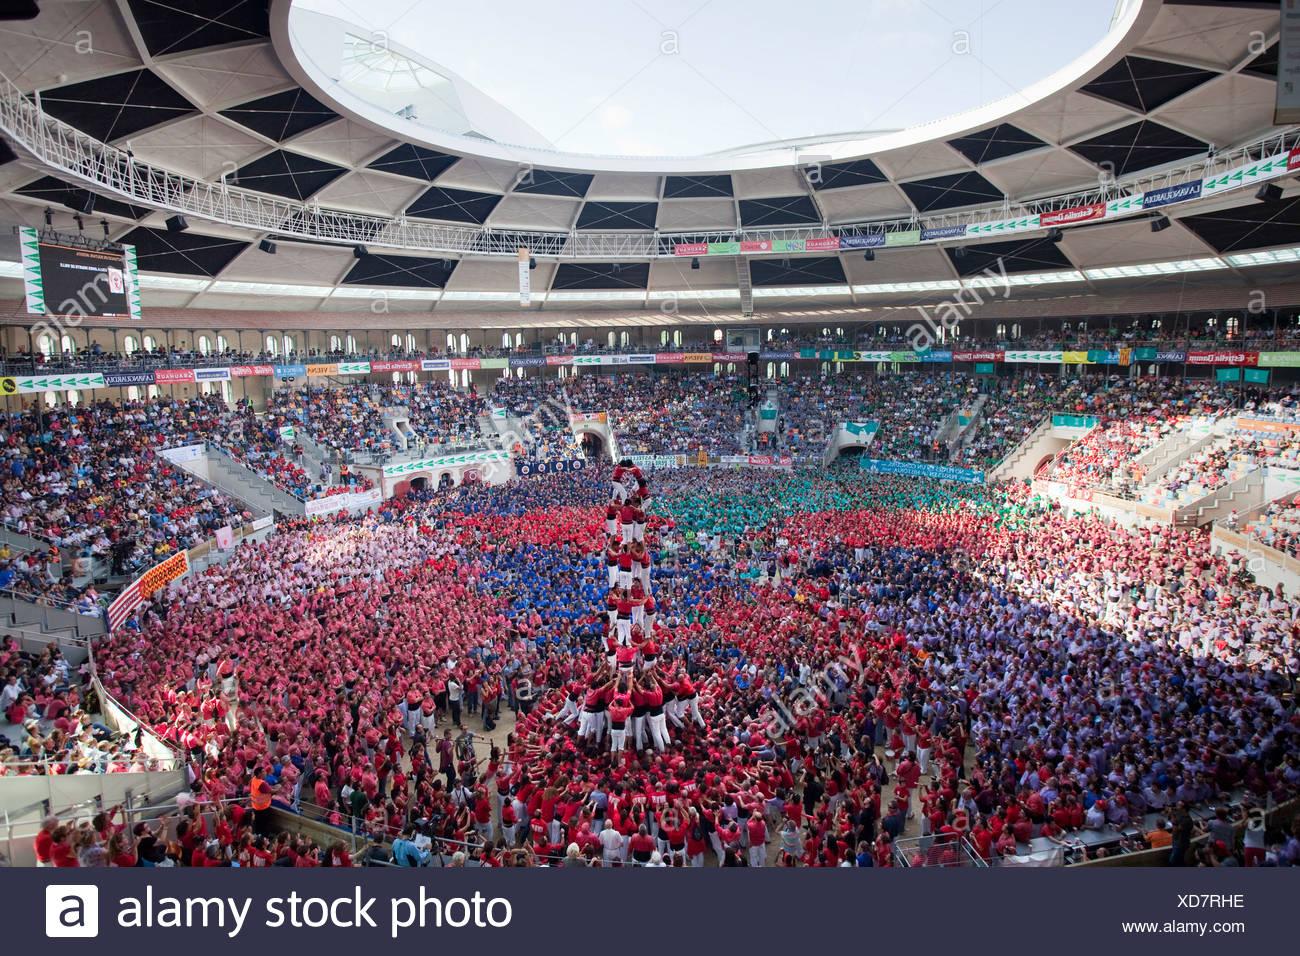 Spanien, Europa, Tarragone, Catalogne, stade, Castellers, festival, pyramide humaine, masses, Castells, tradition Photo Stock